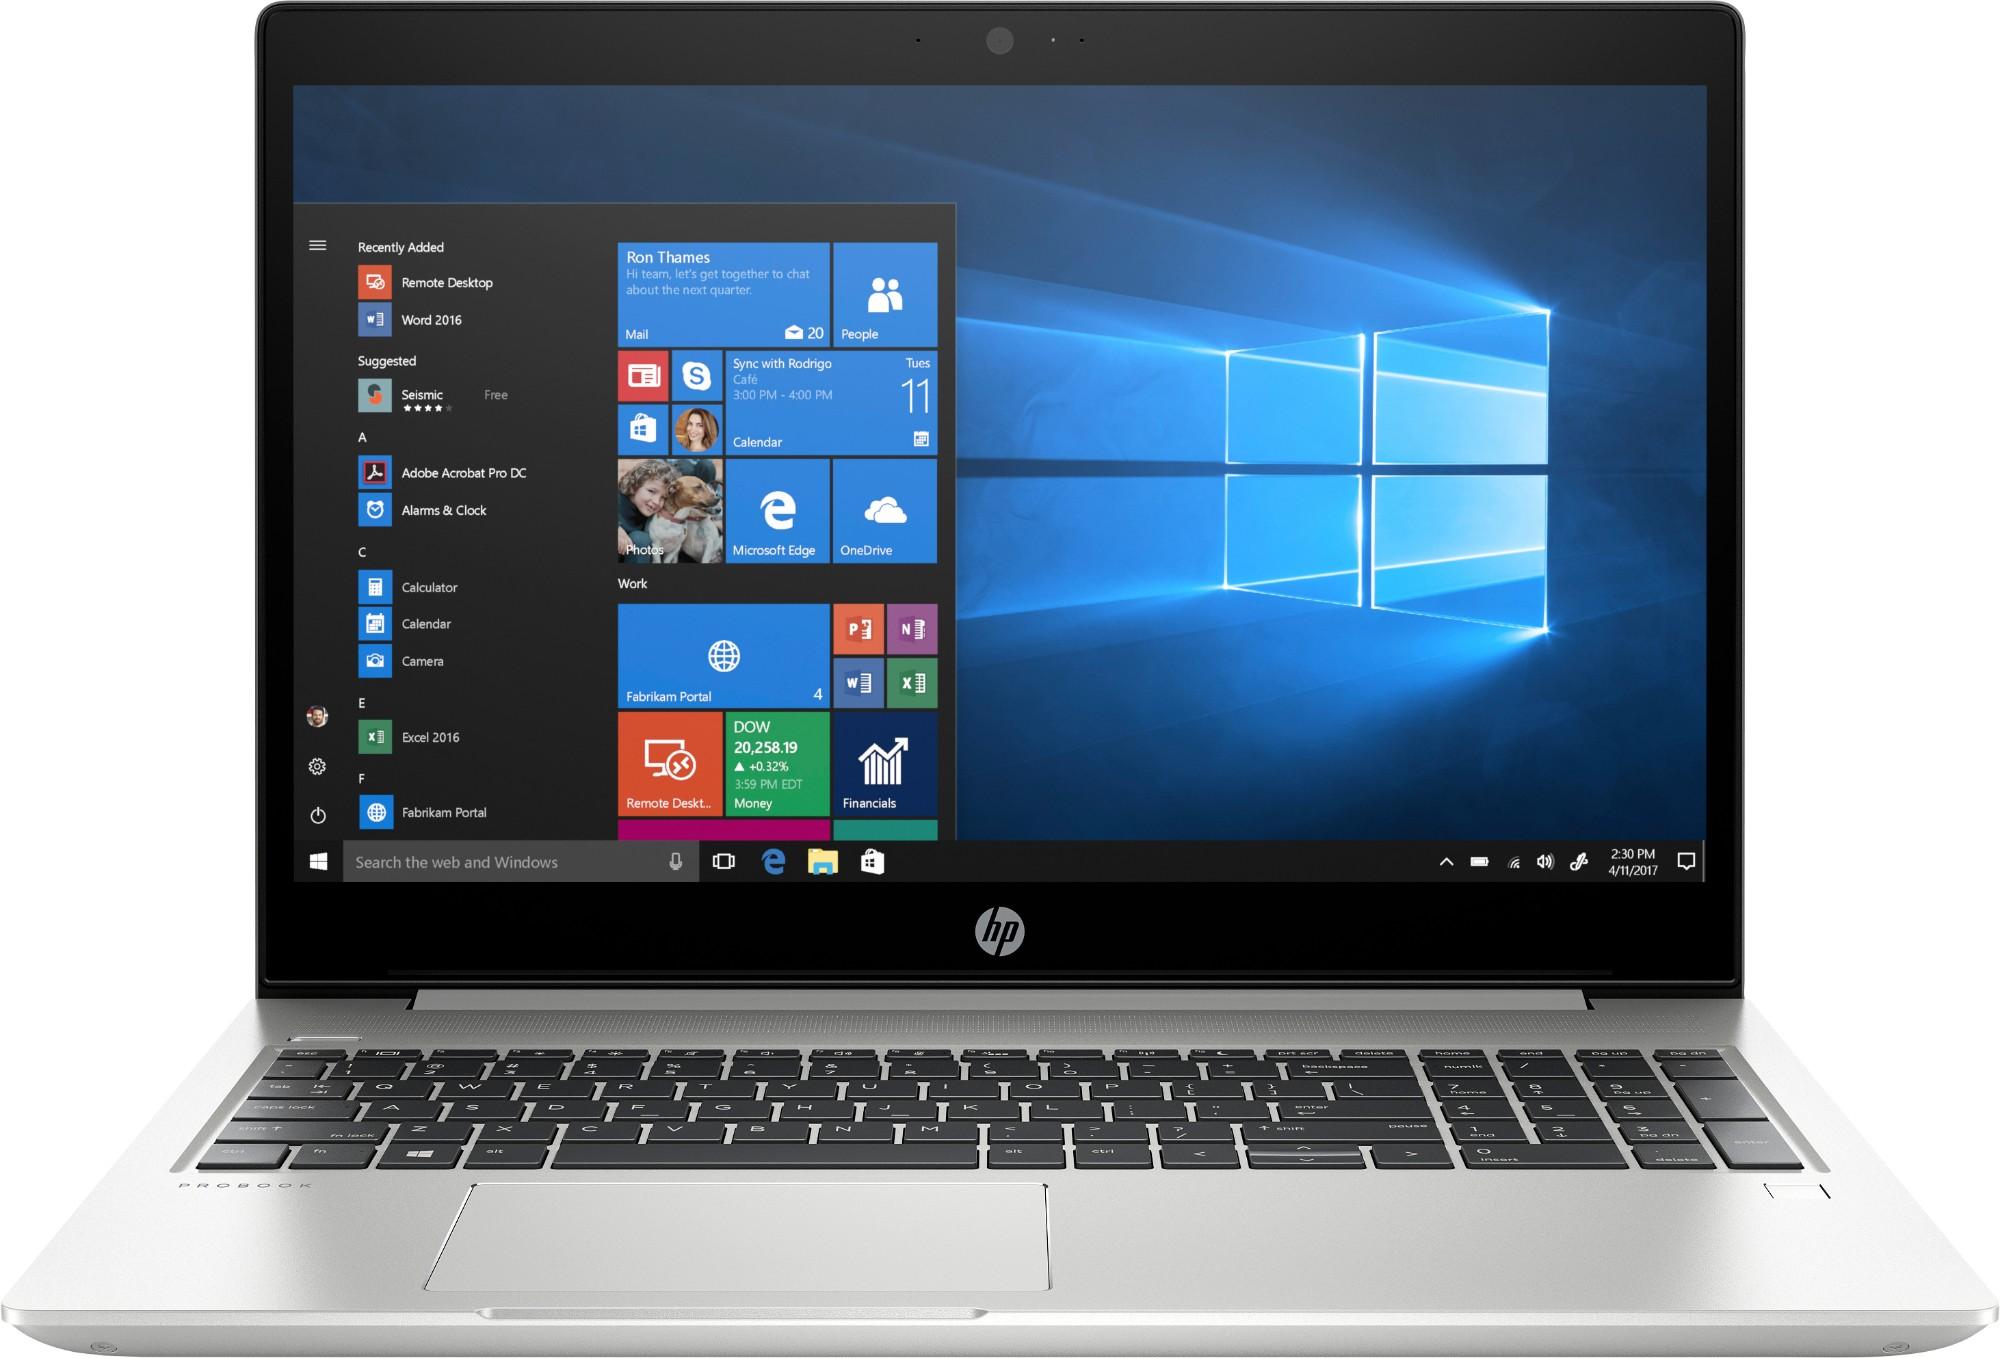 "HP ProBook 455 G6 Silver Notebook 39.6 cm (15.6"") 1920 x 1080 pixels AMD Ryzen 5 PRO 8 GB DDR4-SDRAM 256 GB SSD Windows 10 Pro"